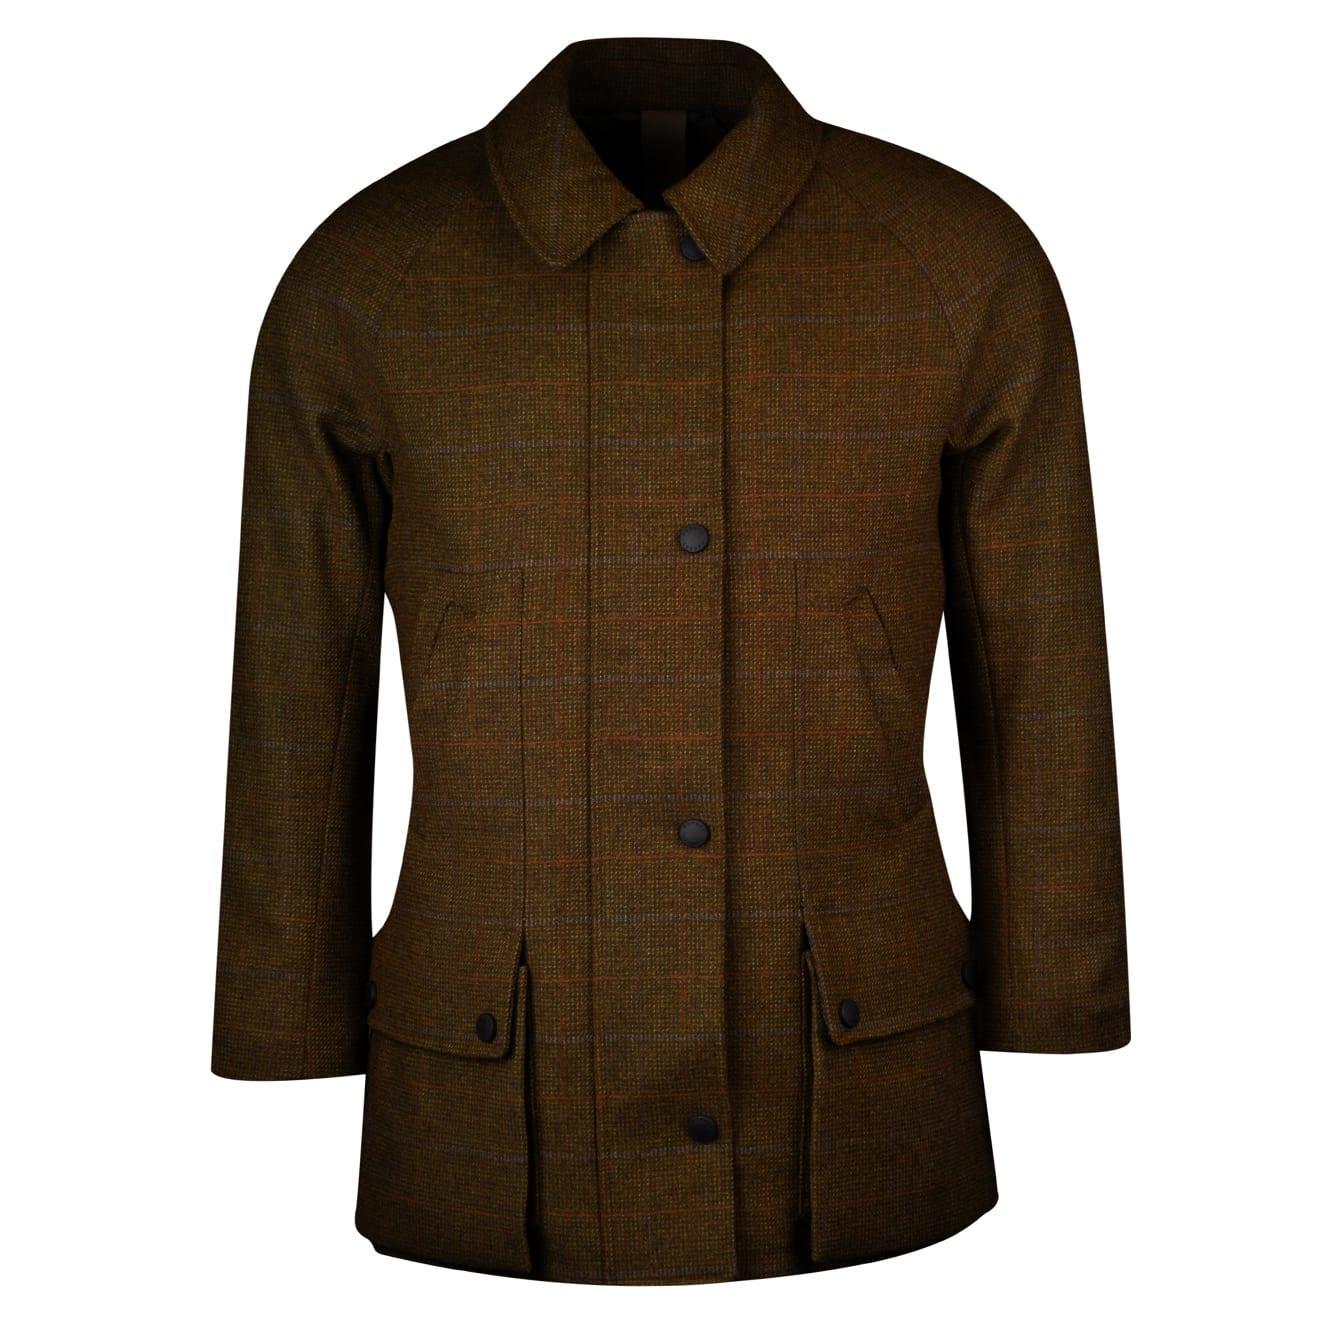 James purdey womens tweed field coat marygold